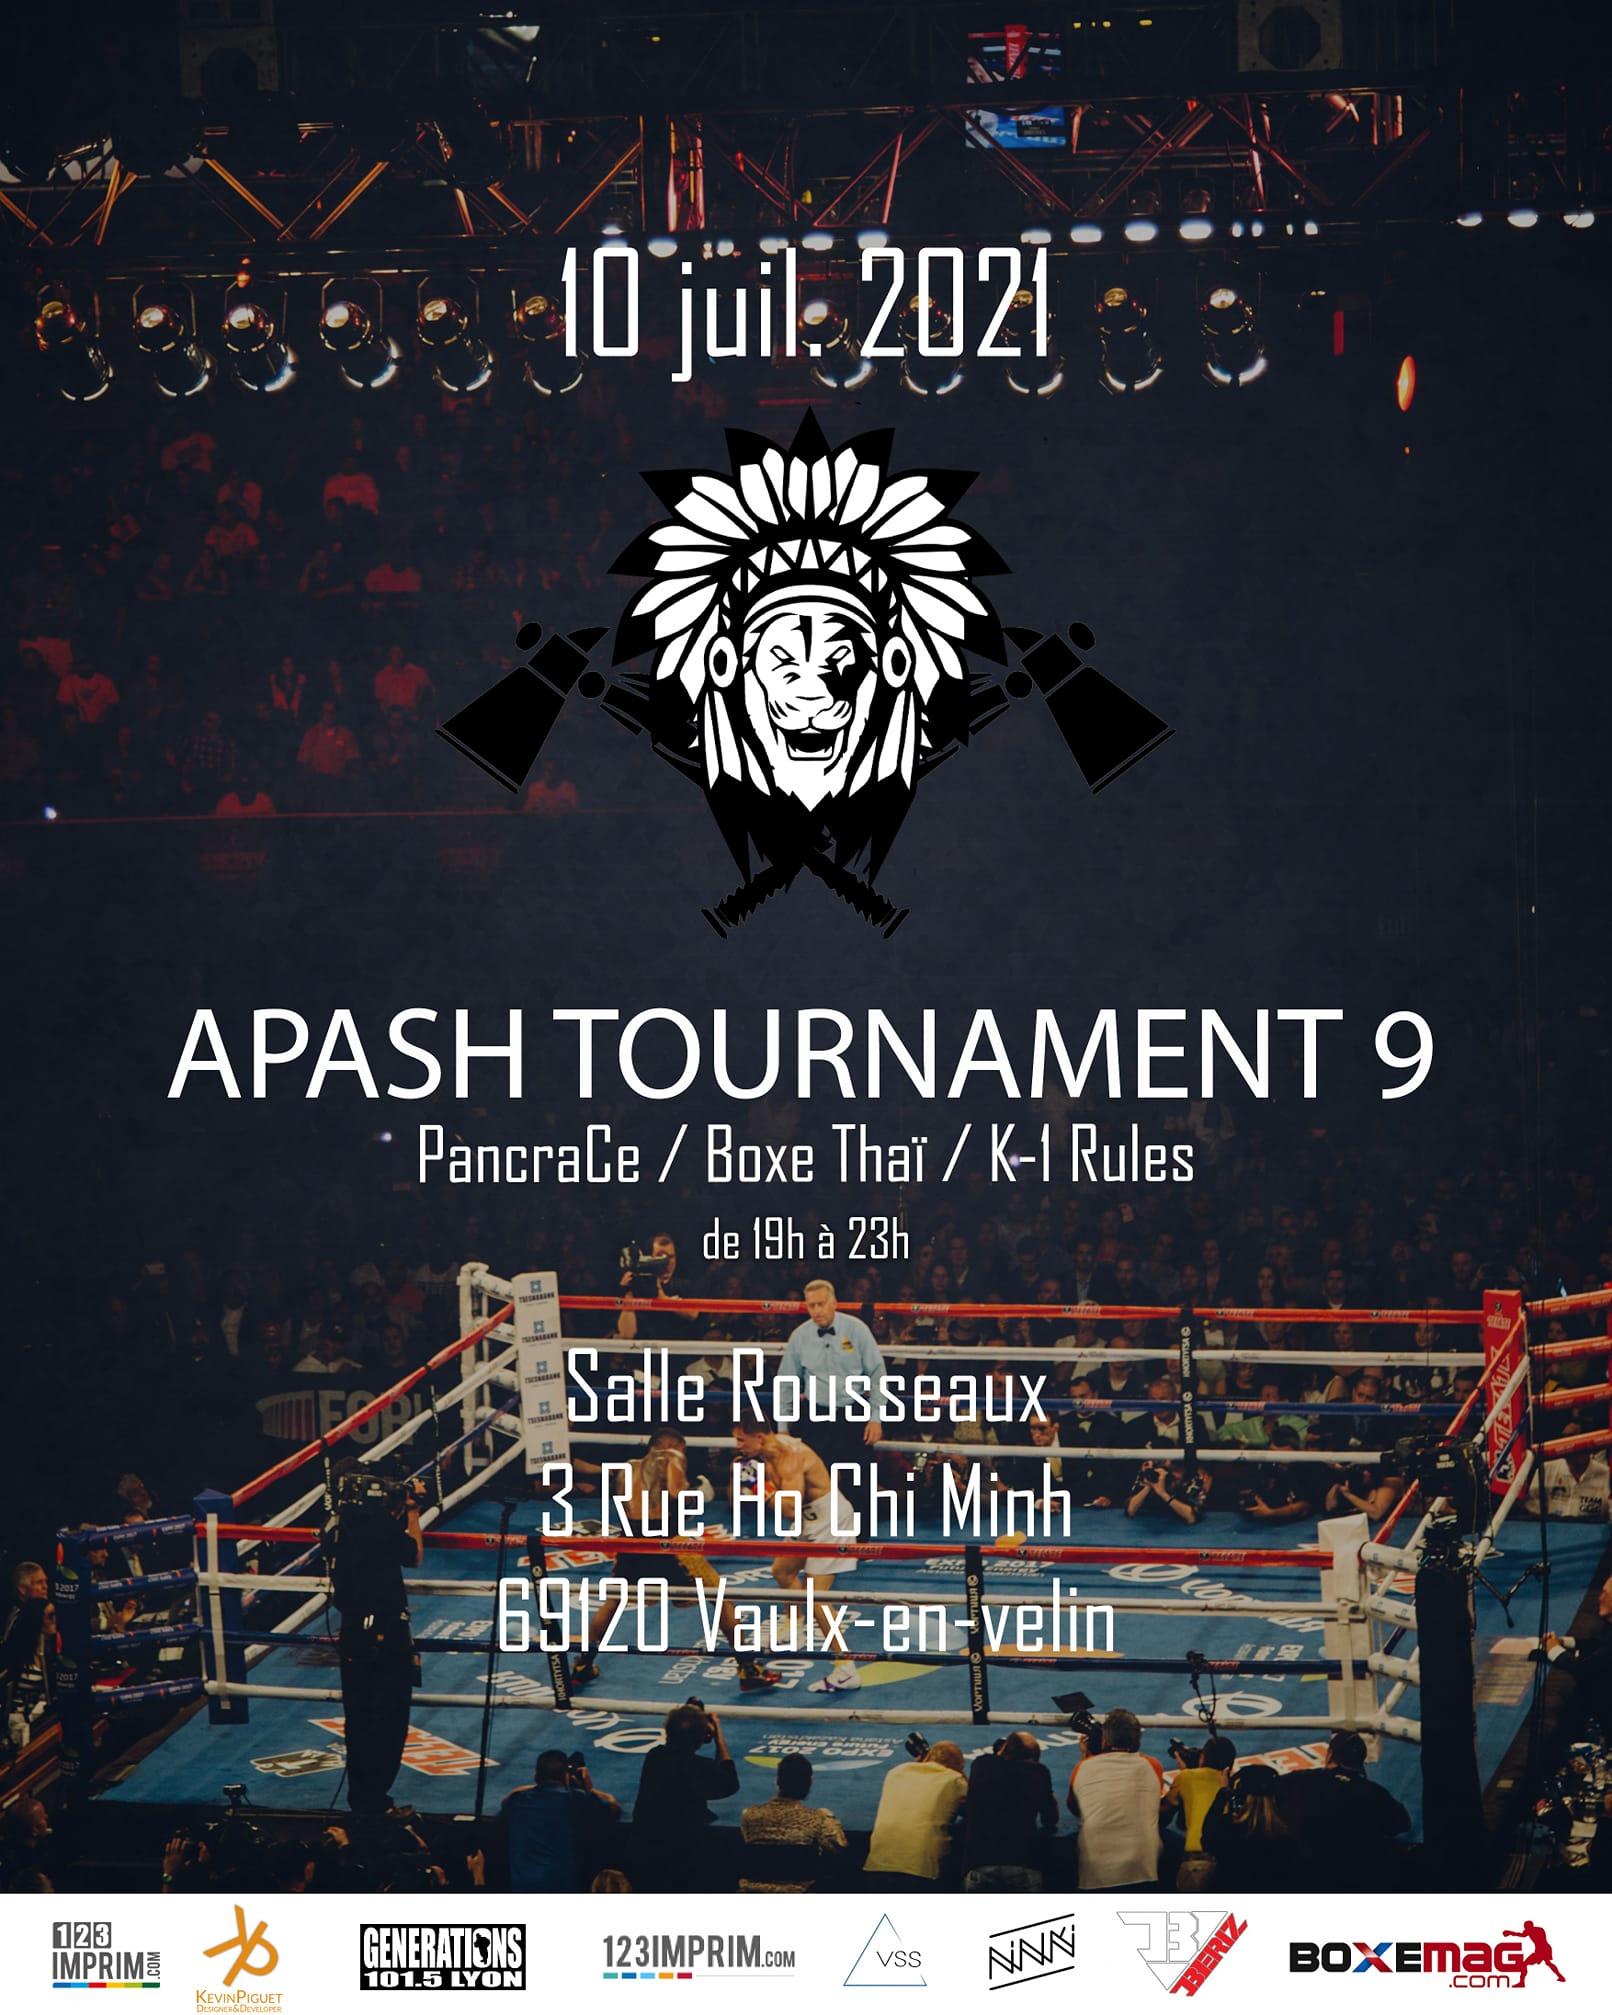 apach tournament 9